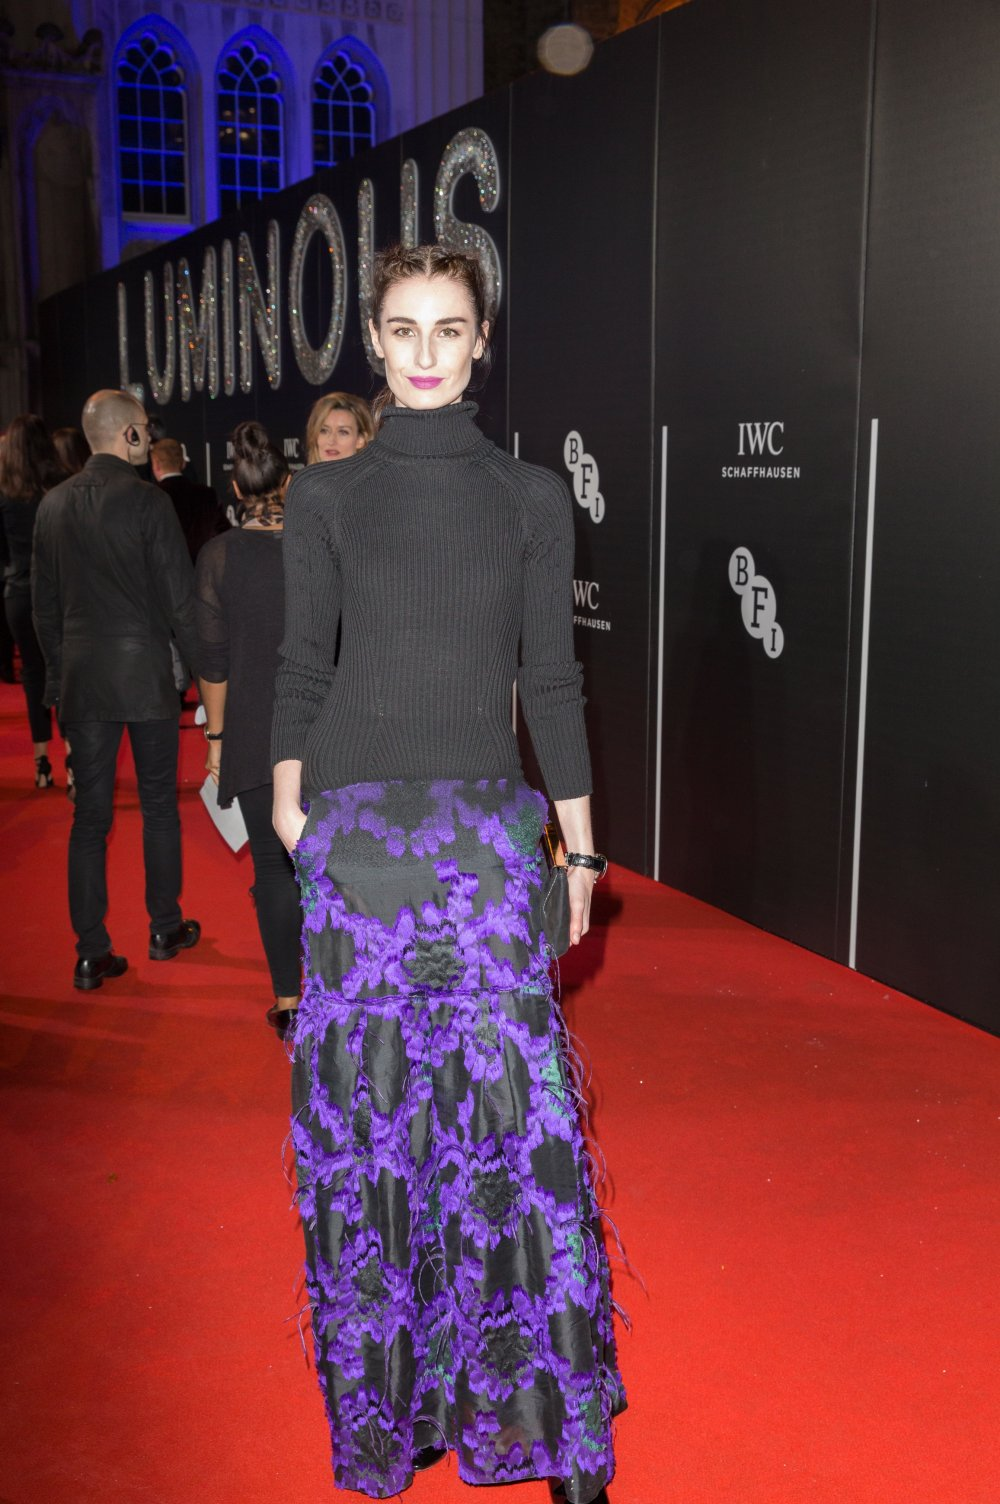 Erin O'Connor attends the BFI LUMINOUS gala 2015